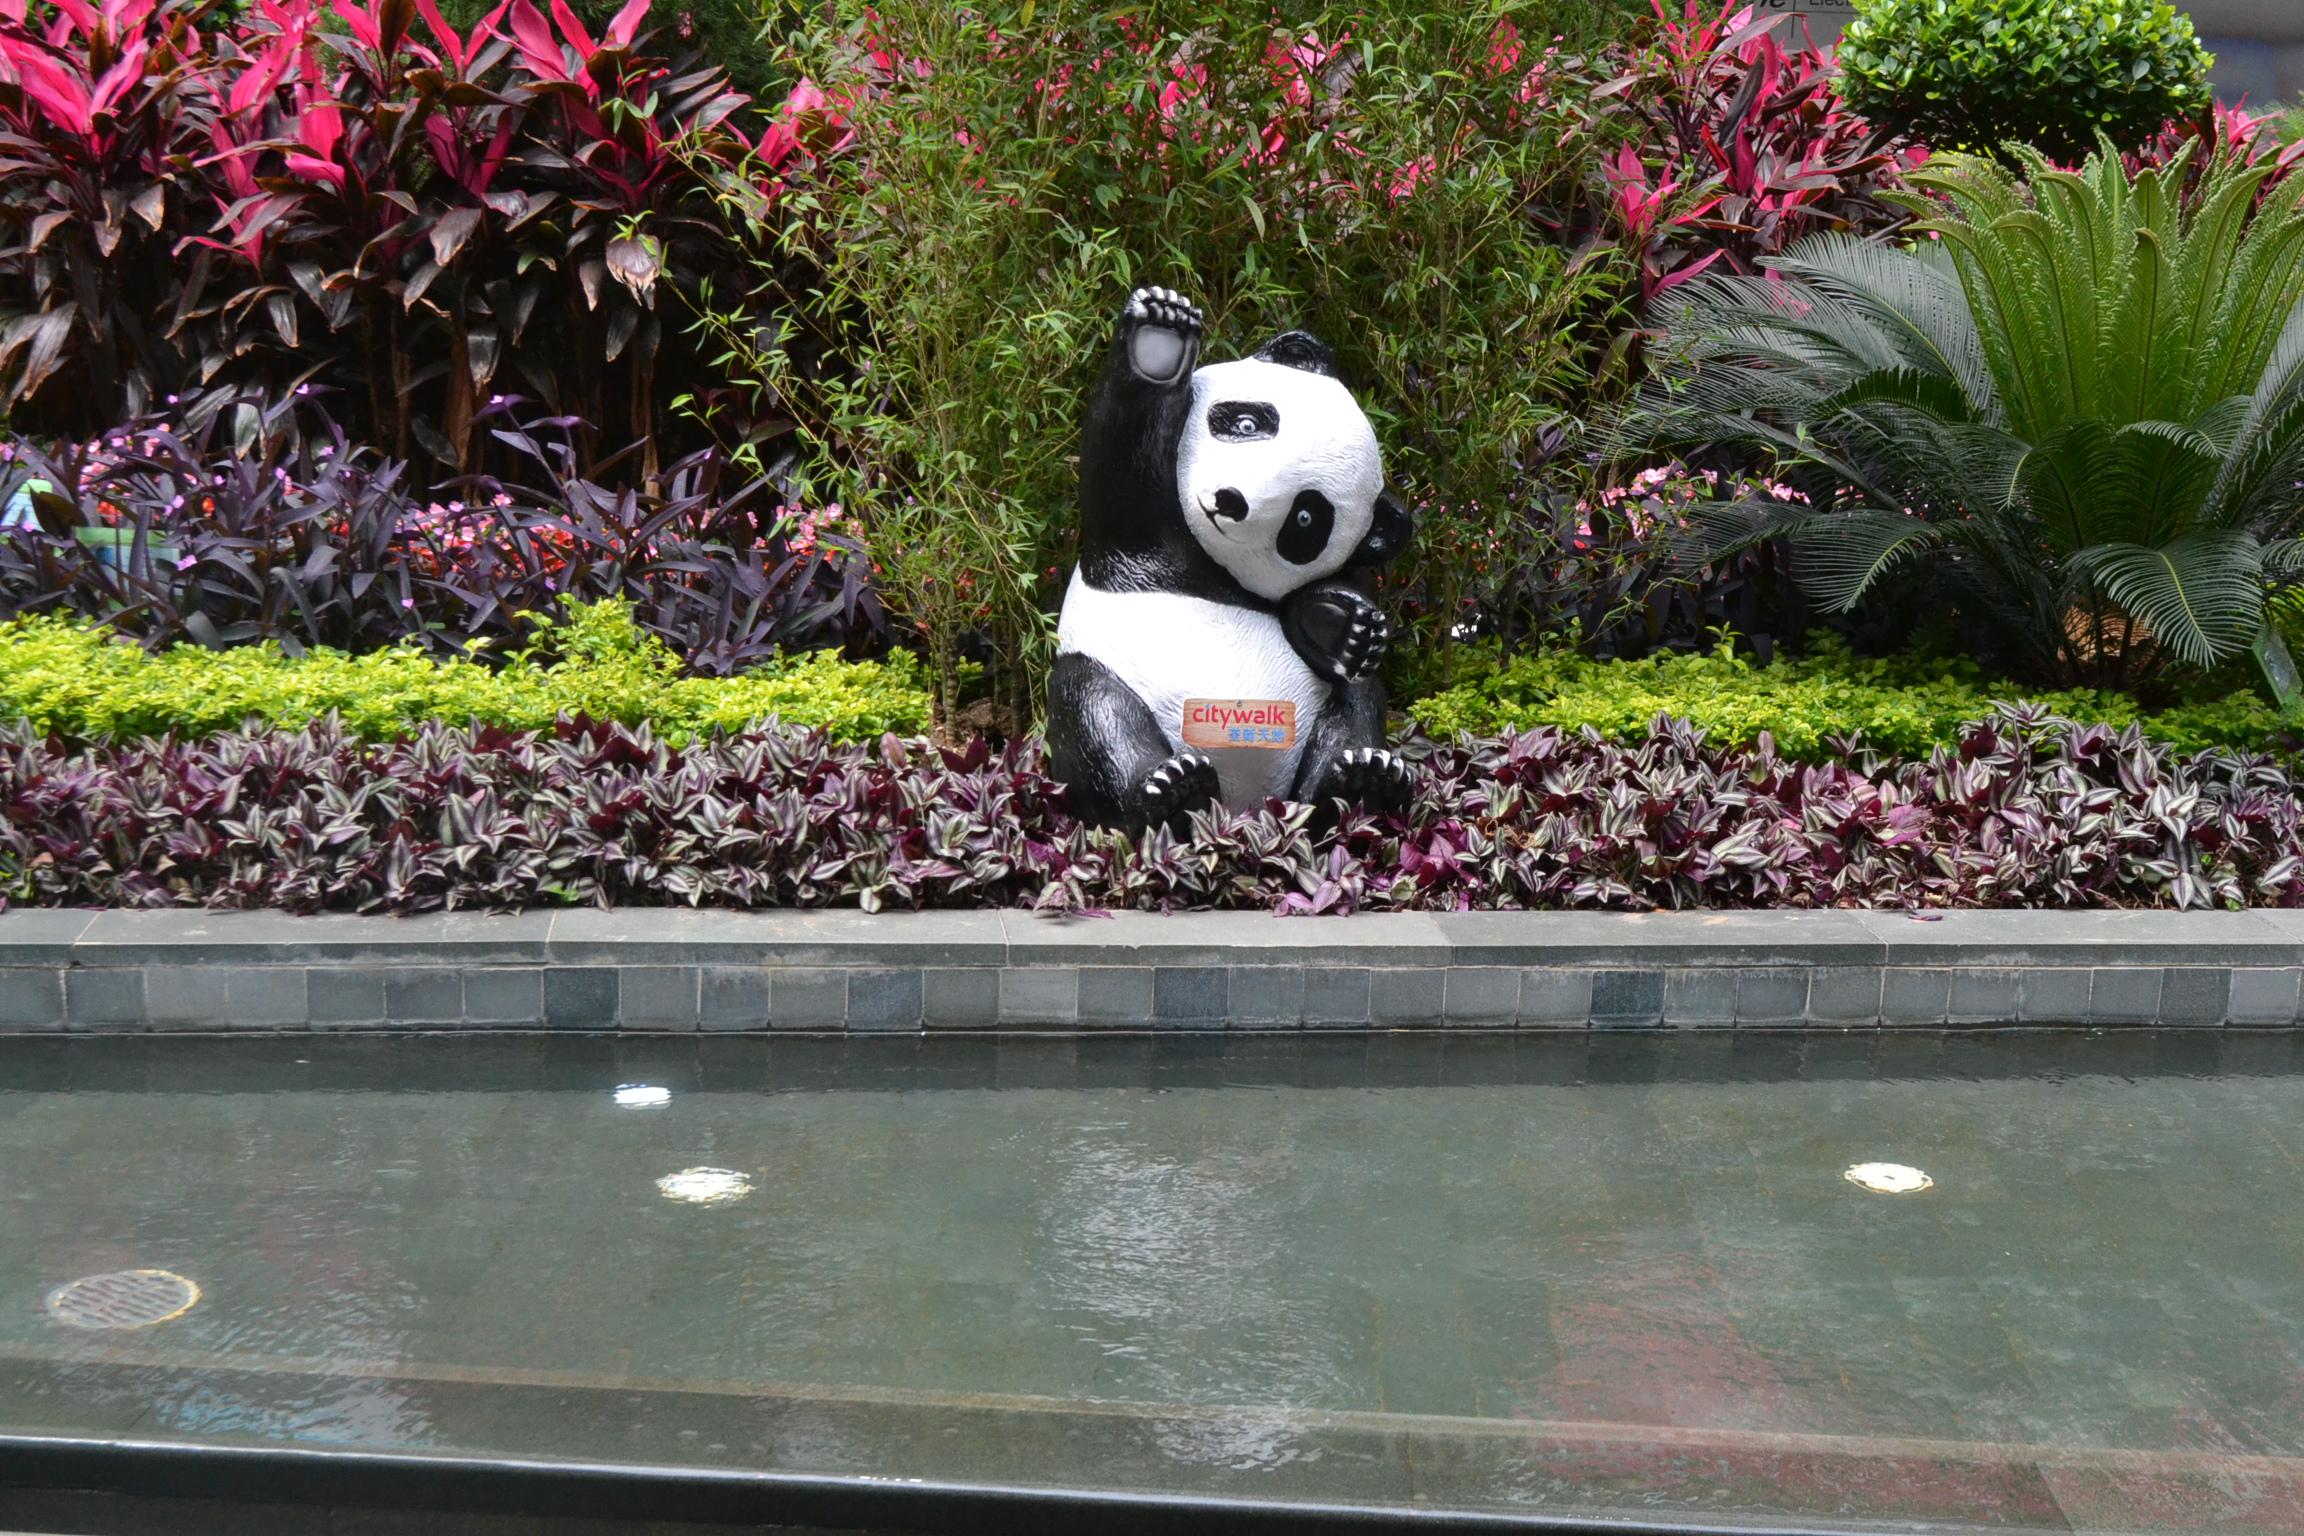 daisybutter - UK Style and Fashion Blog: hong kong photo diary, dim sum, city landscape, tsim sa tsui, tsuen wan, central